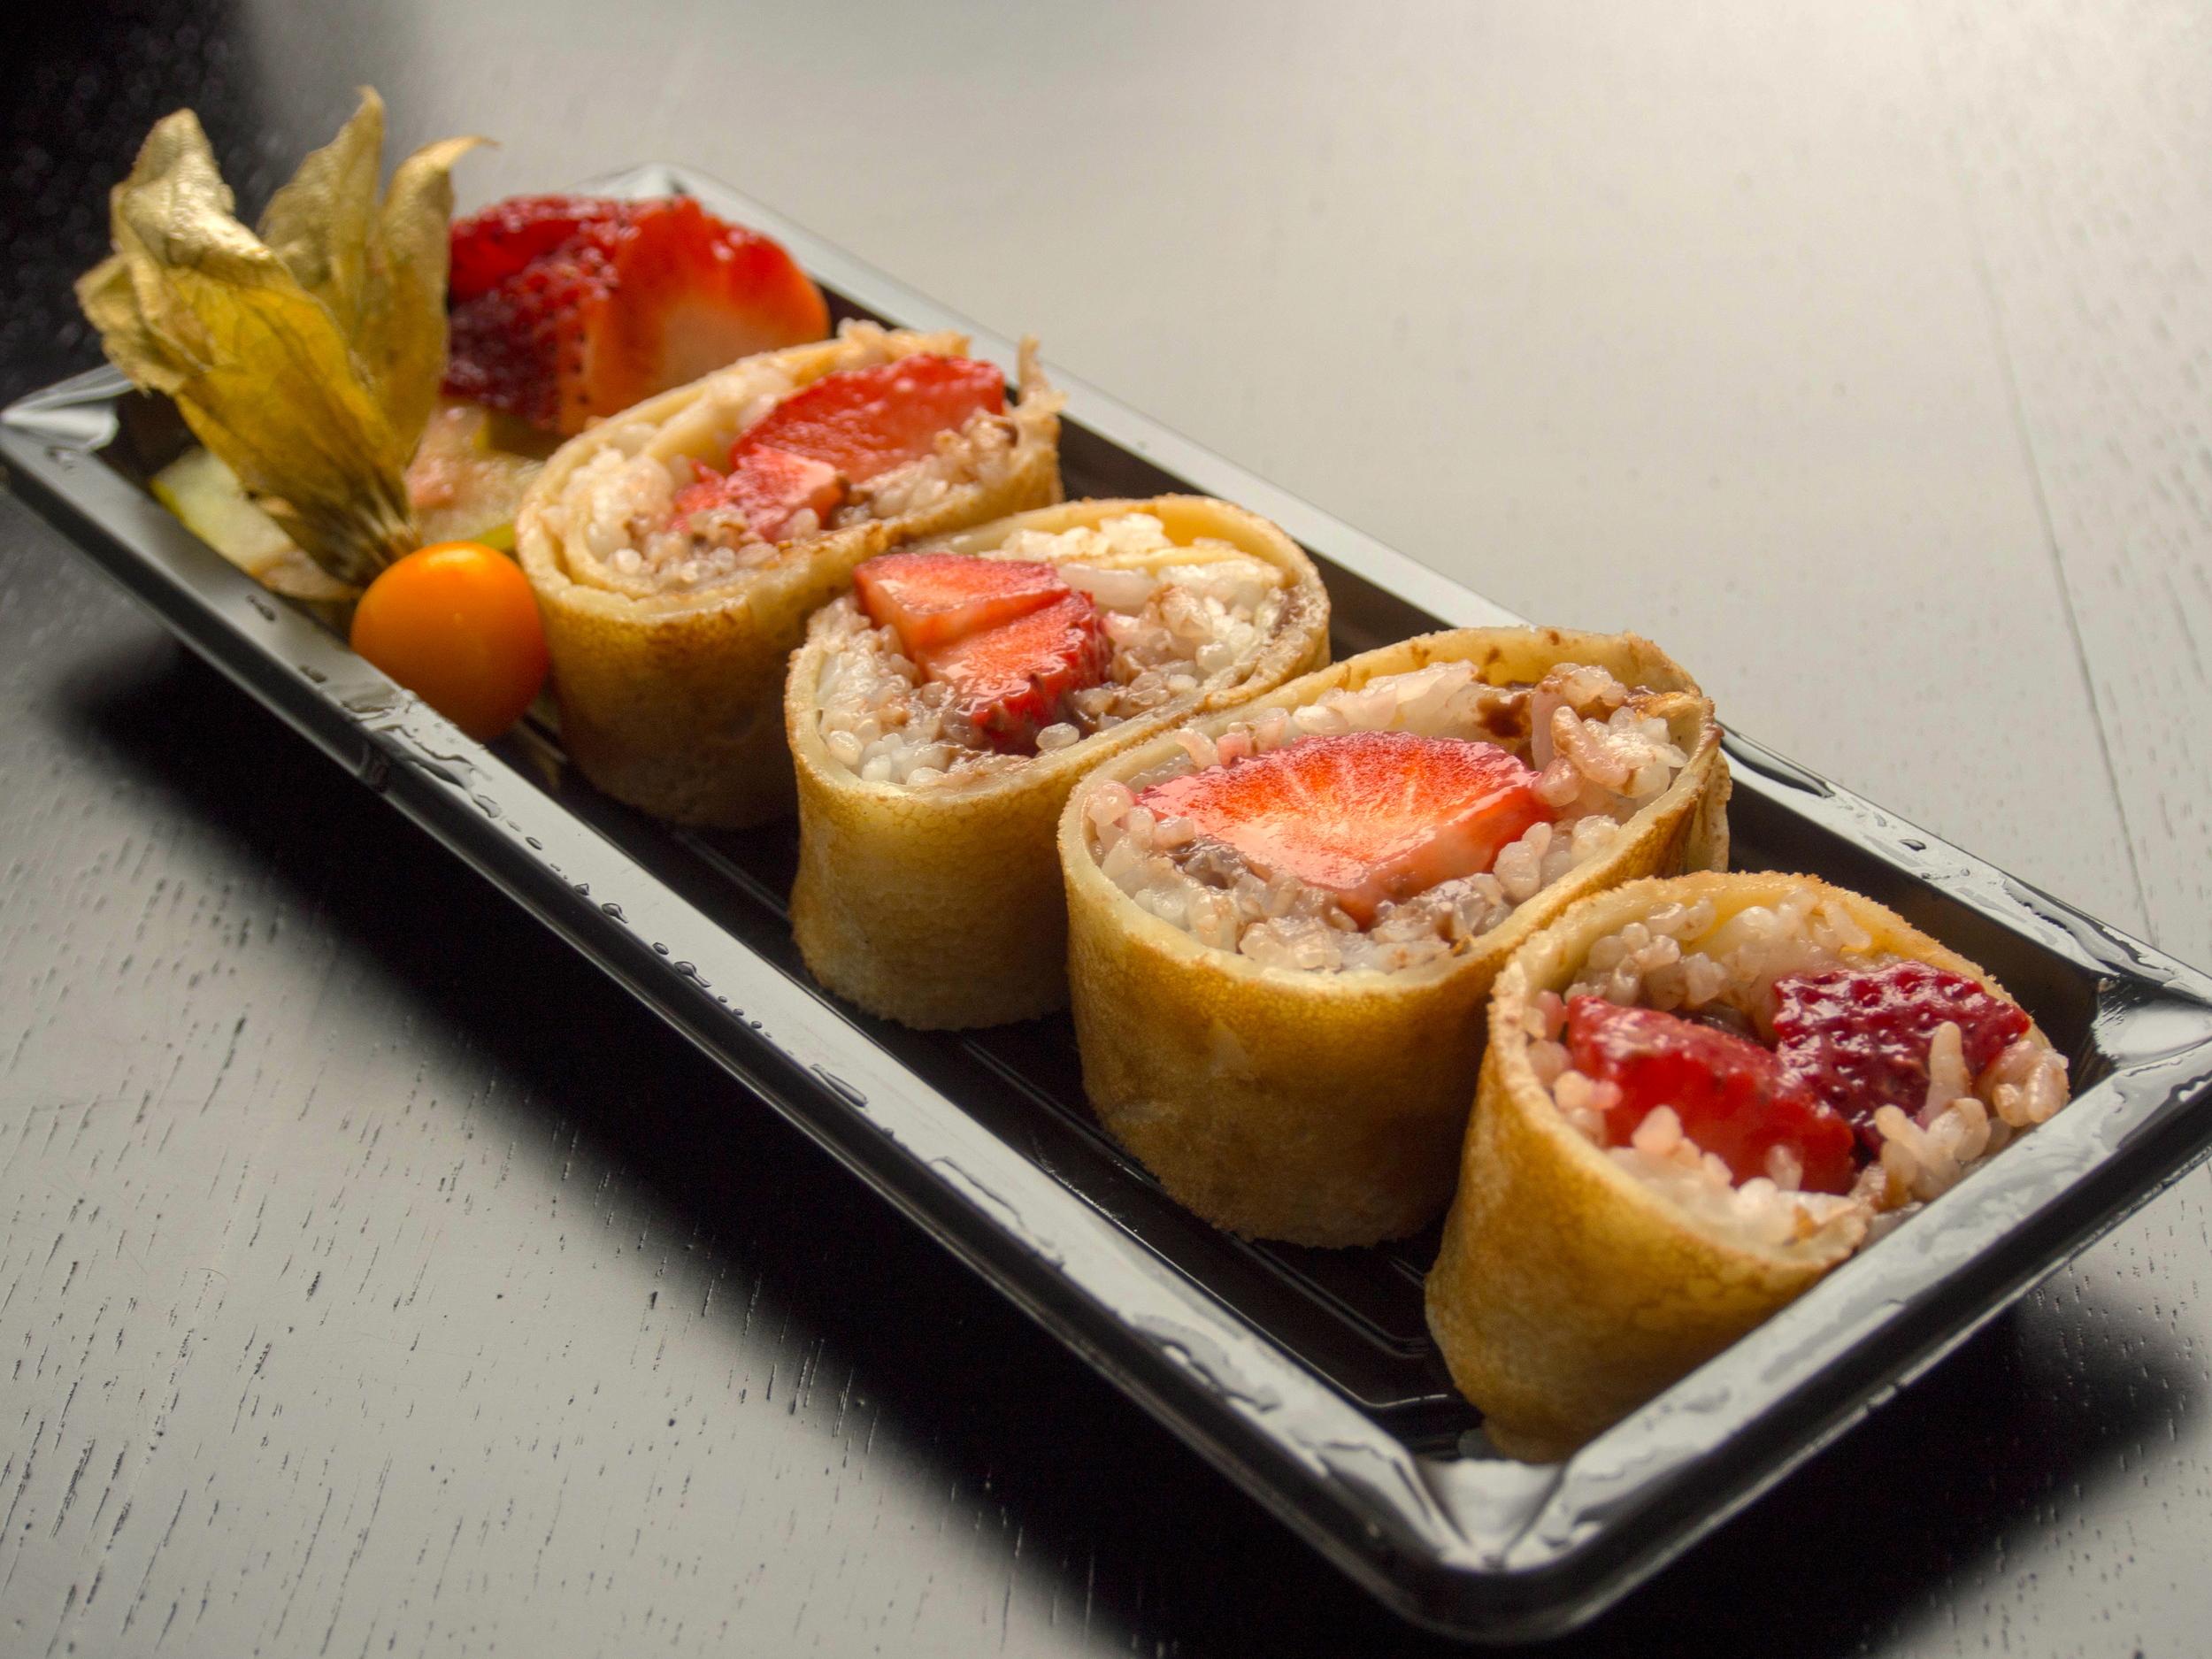 Tak takto nejako vyzerajú sushi palacinky s jahodami.